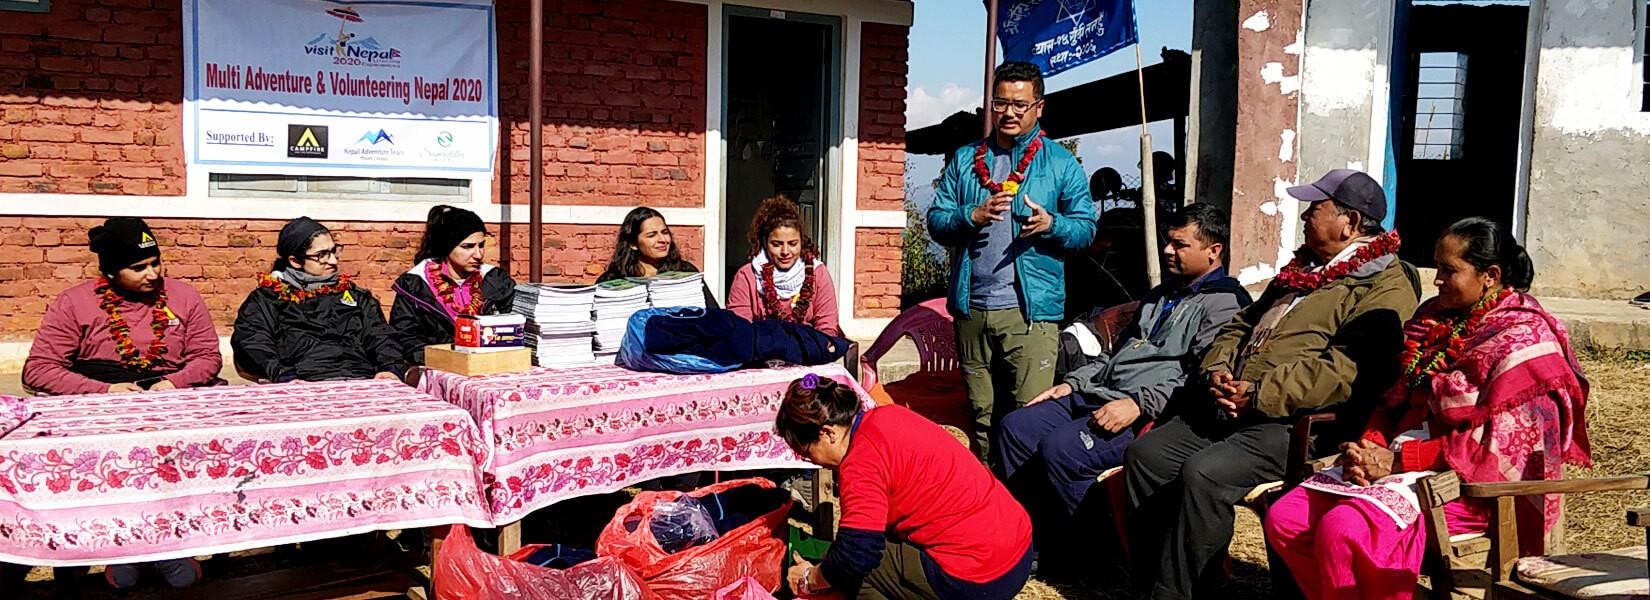 Nepal Adventure Team Corporate Social Responsibility